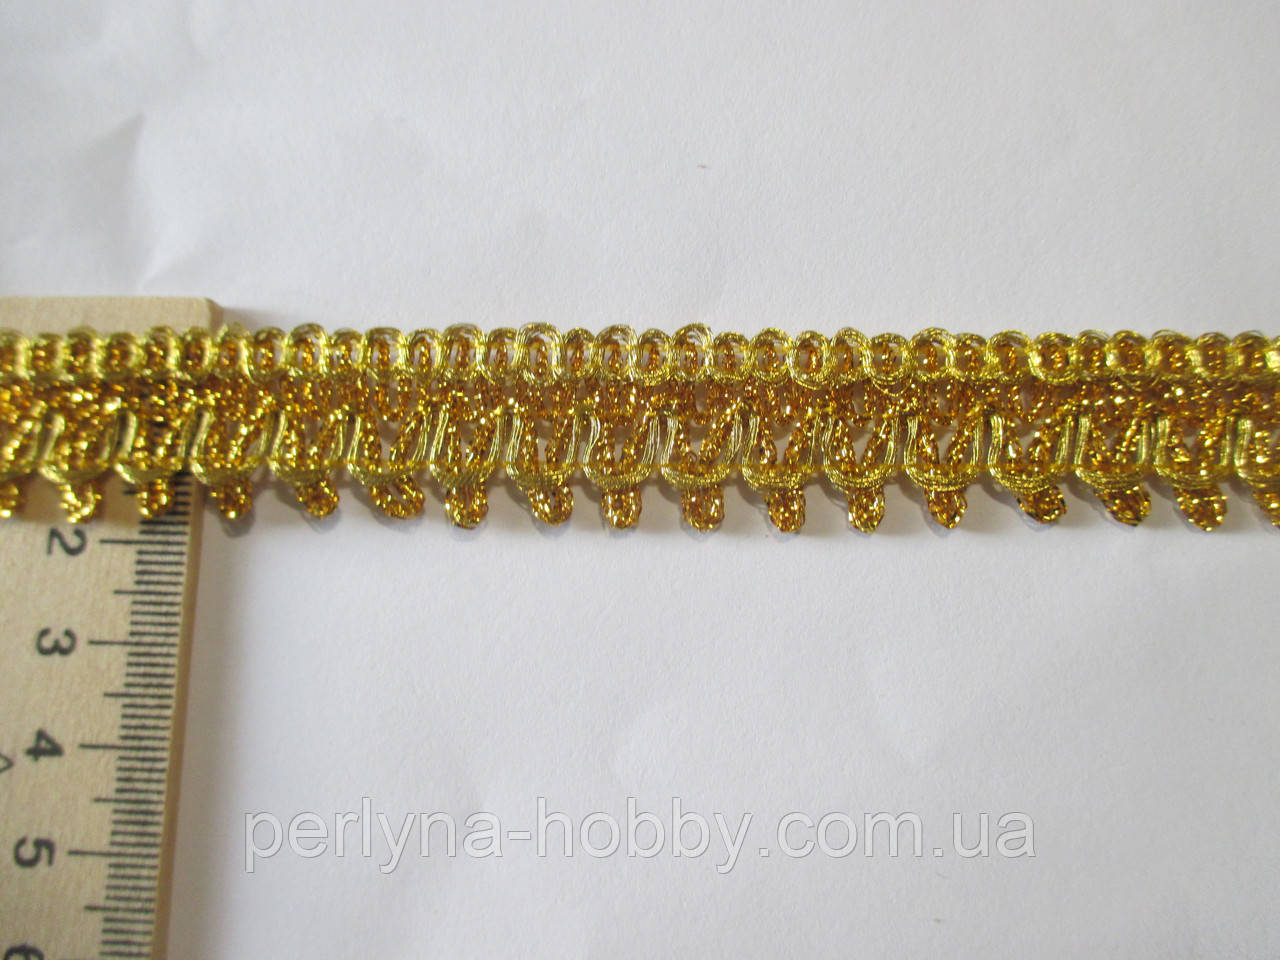 Тасьма декоративна люрекс золото зубчики 1.8-2 см см